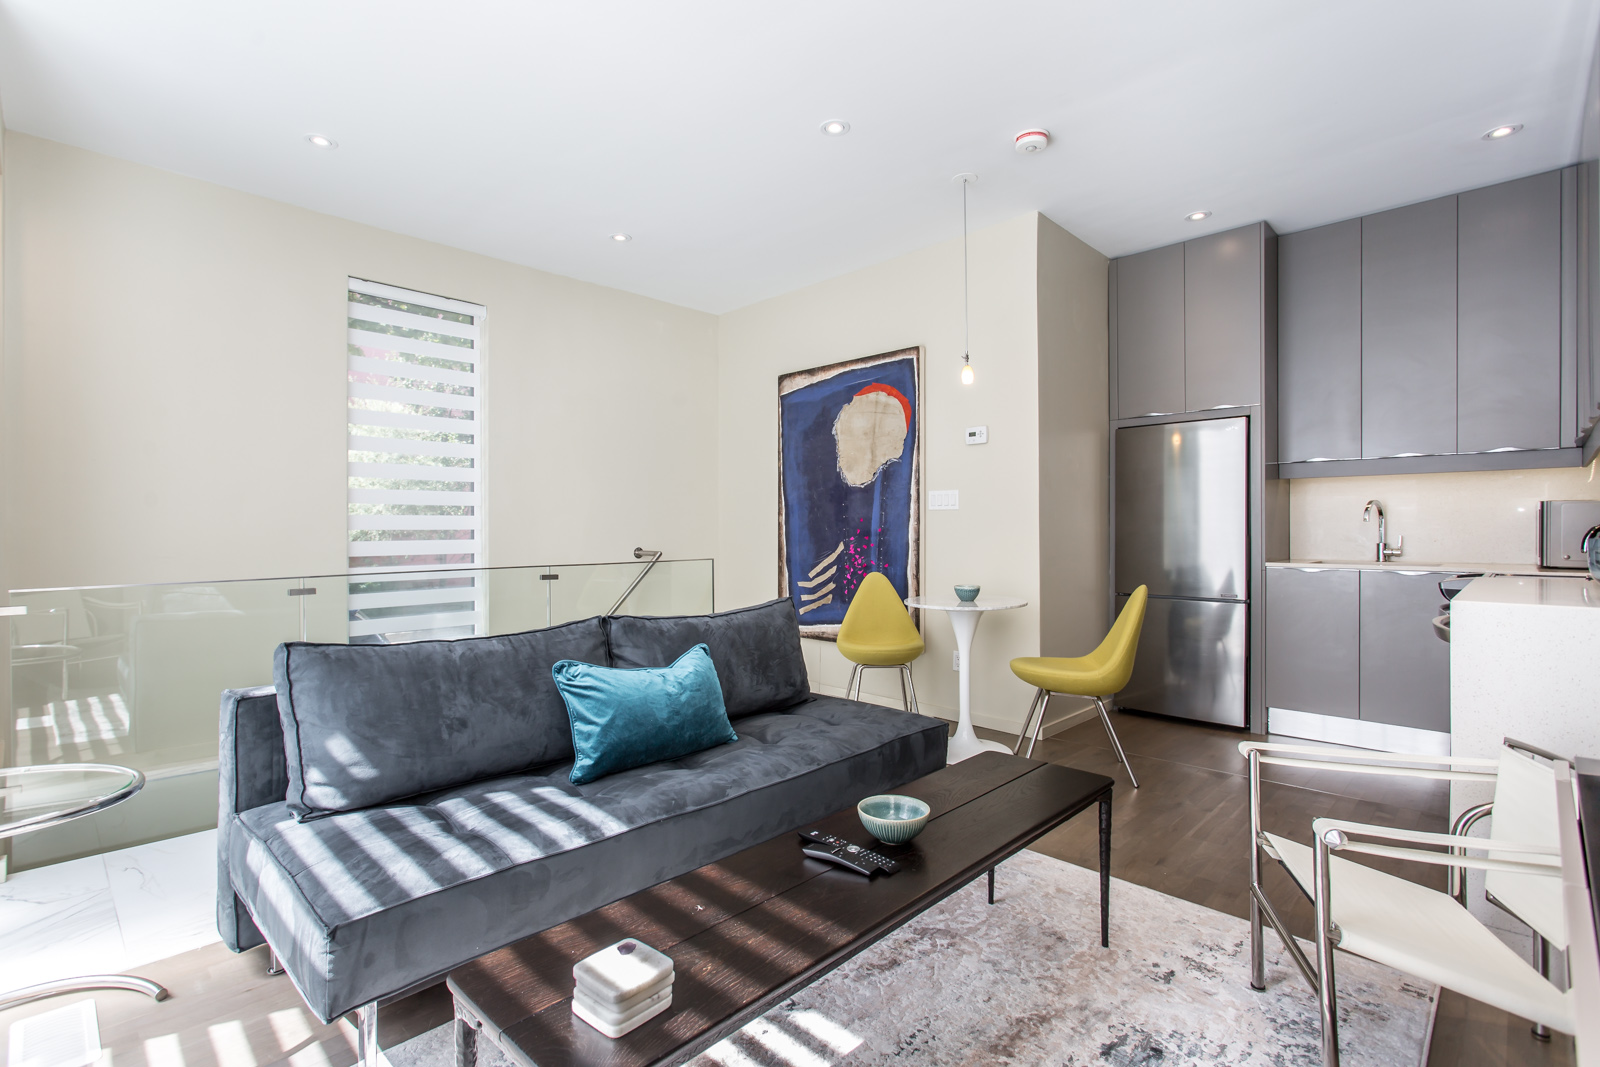 Photo of 115 Maitland Street interior and living room.